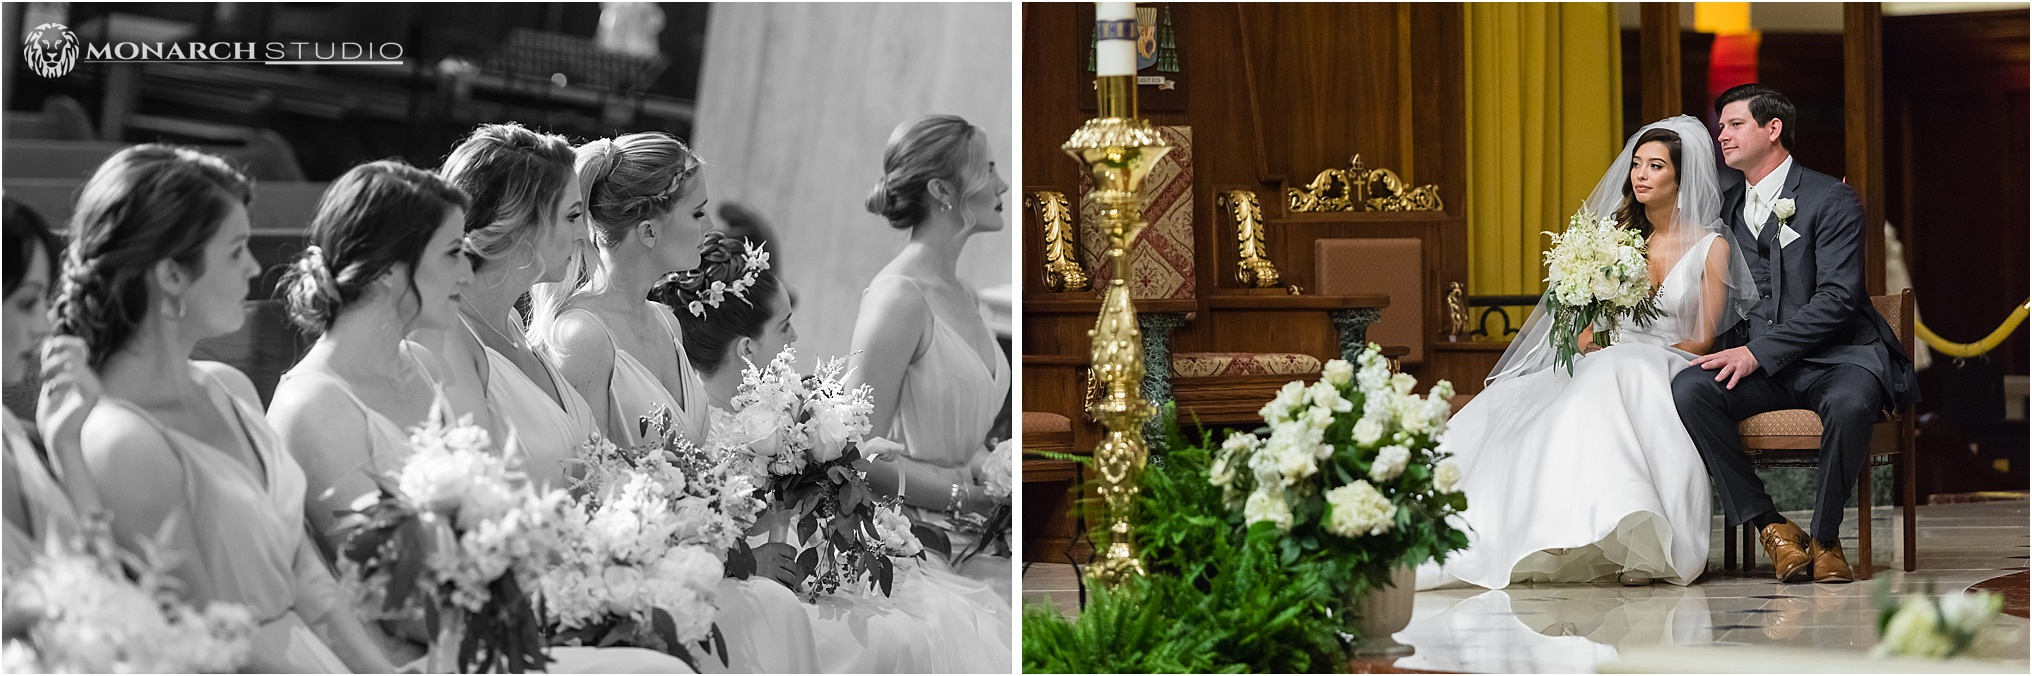 st-augustine-wedding-photographer-059.jpg